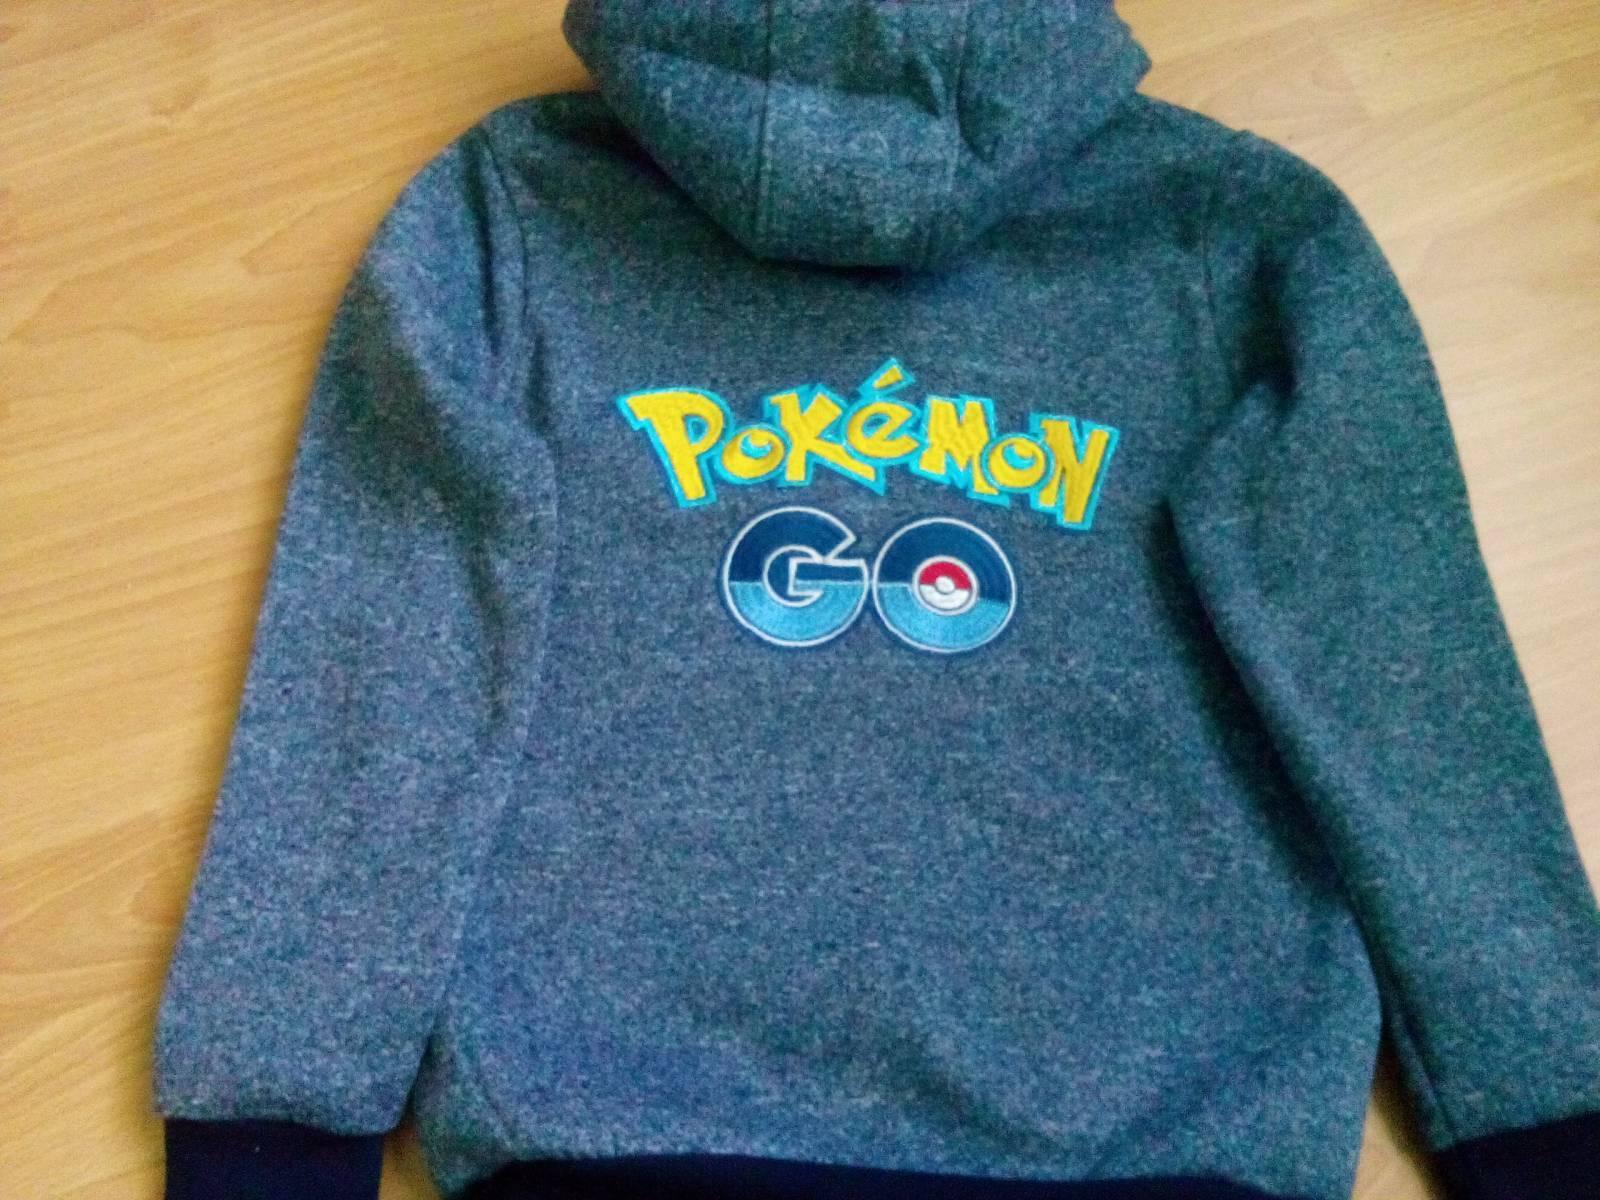 fleece jacket with Pokemon Go logo embroidery design